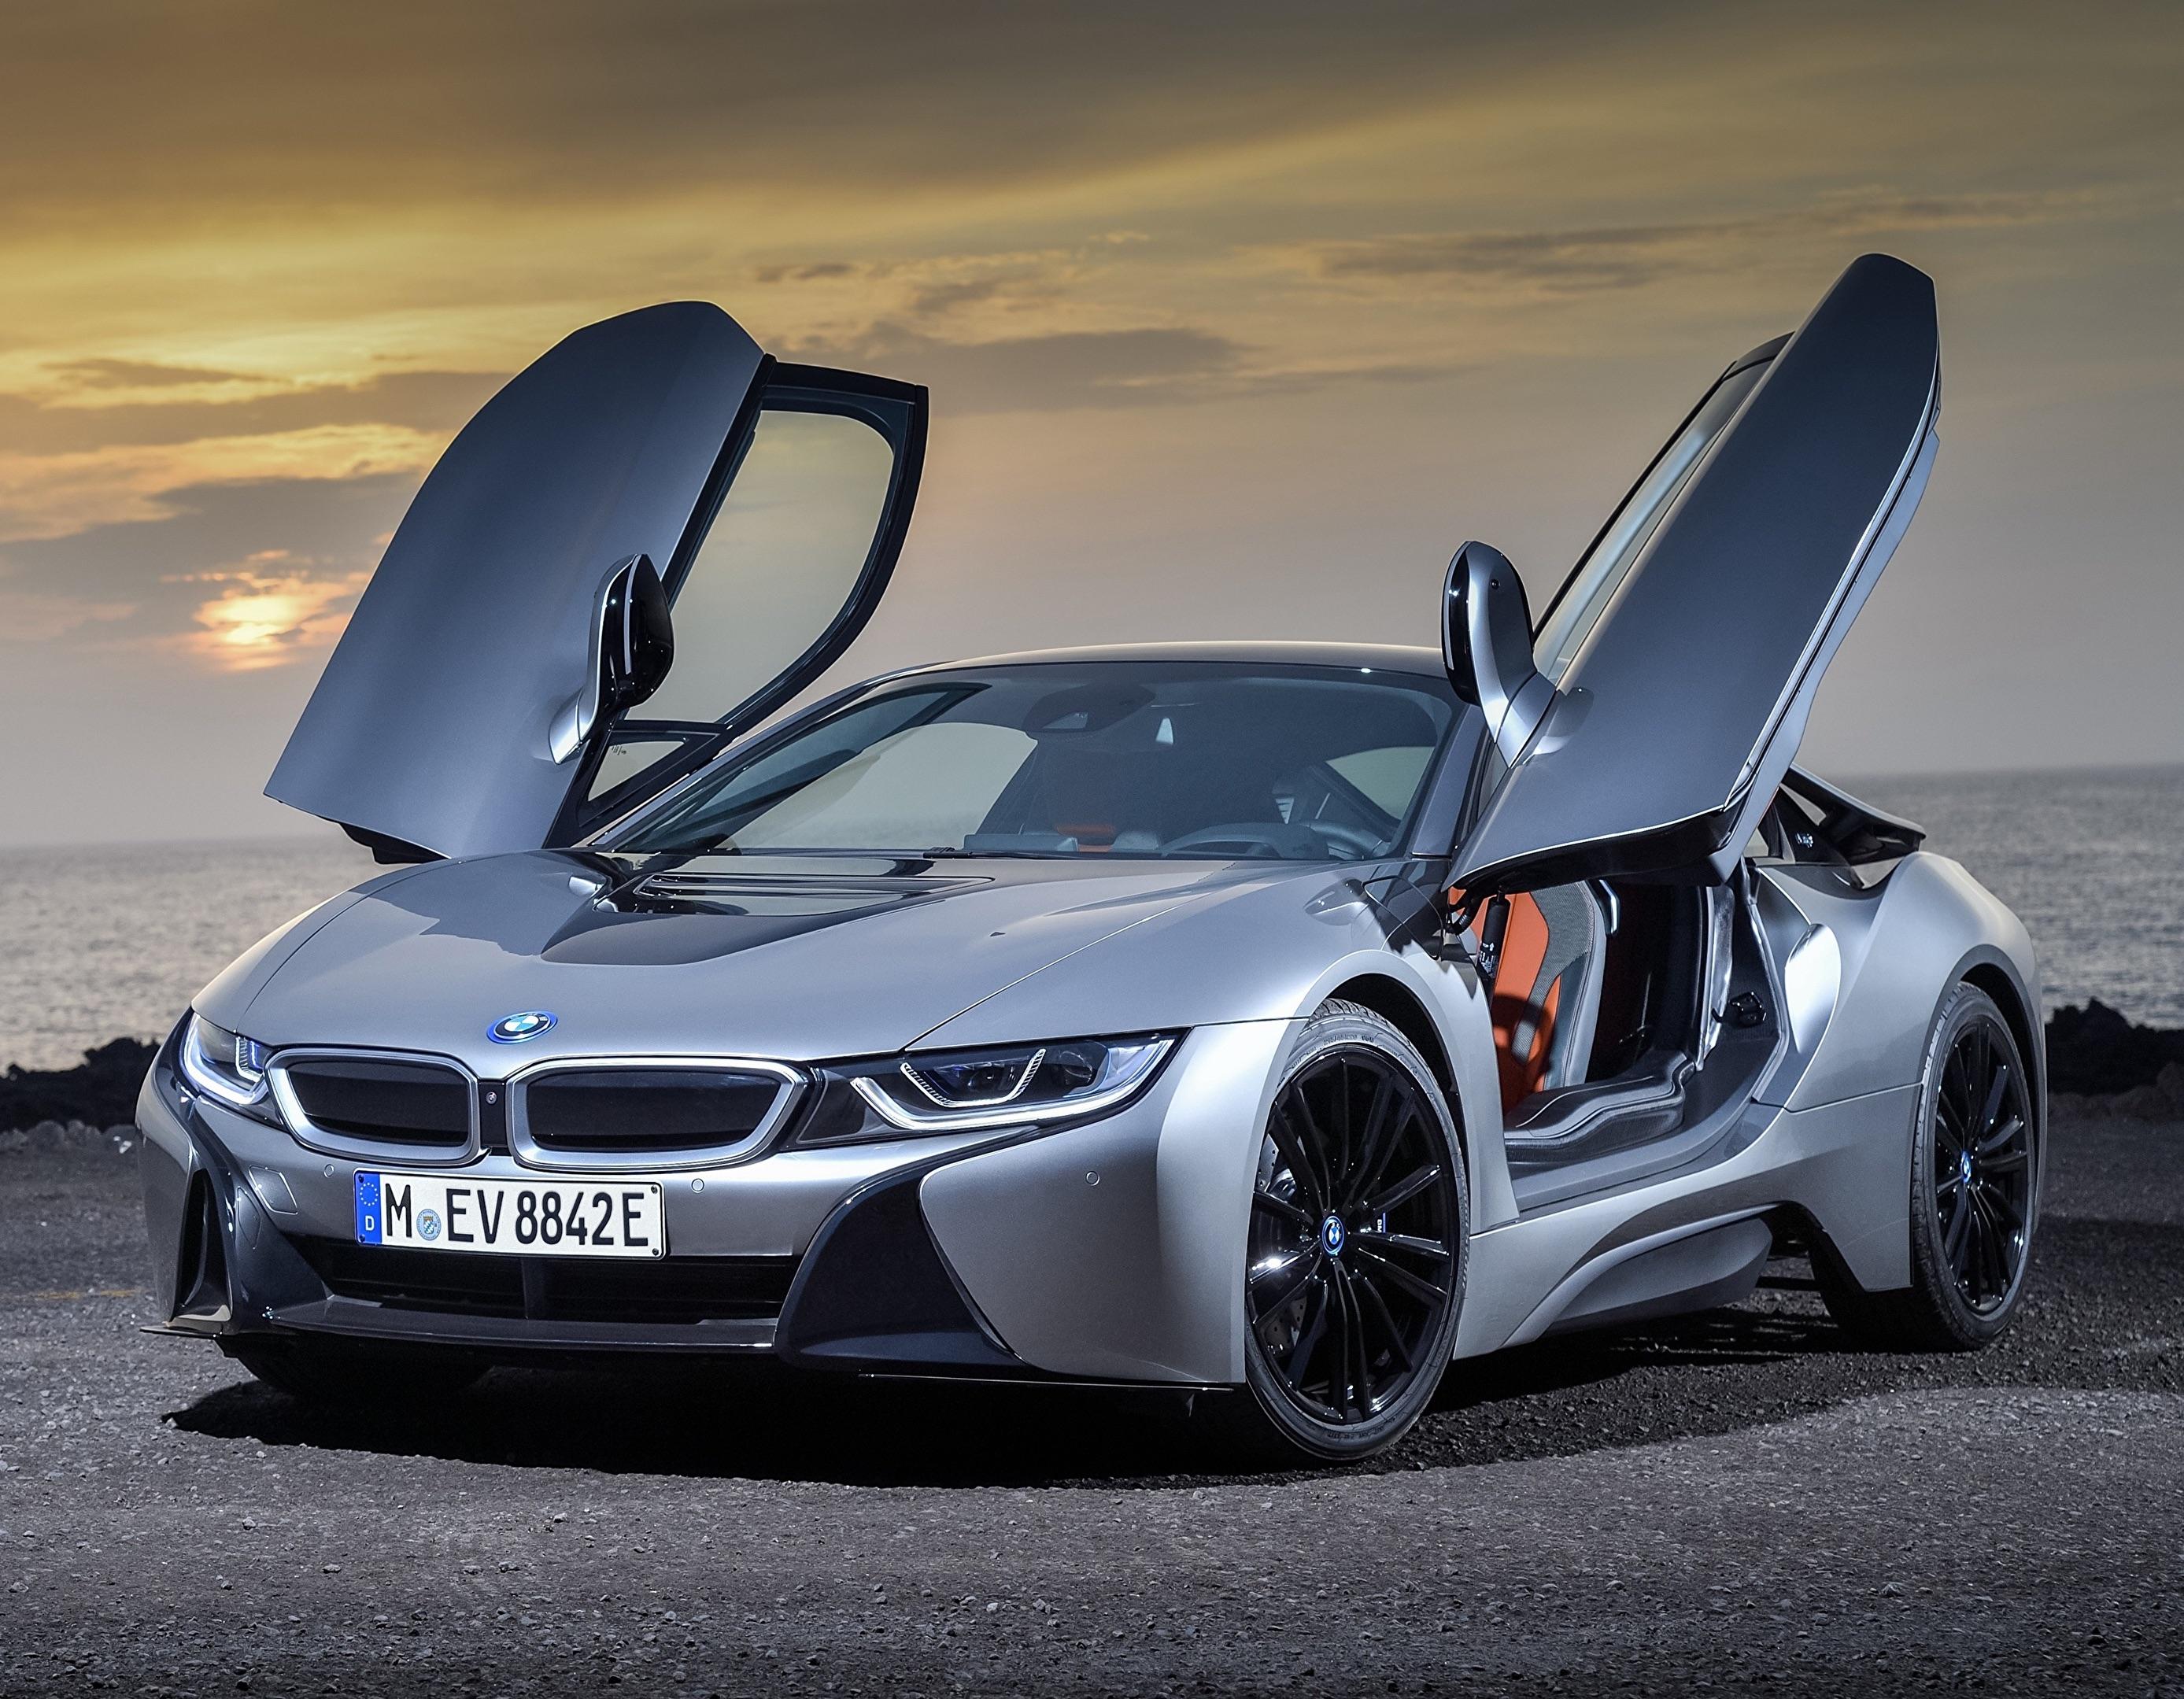 BMW i8 Coupé (374 PS) - 859€ / Monat, 24 Monate, EZ 03/18 im [Privat- & Gewerbeleasing]